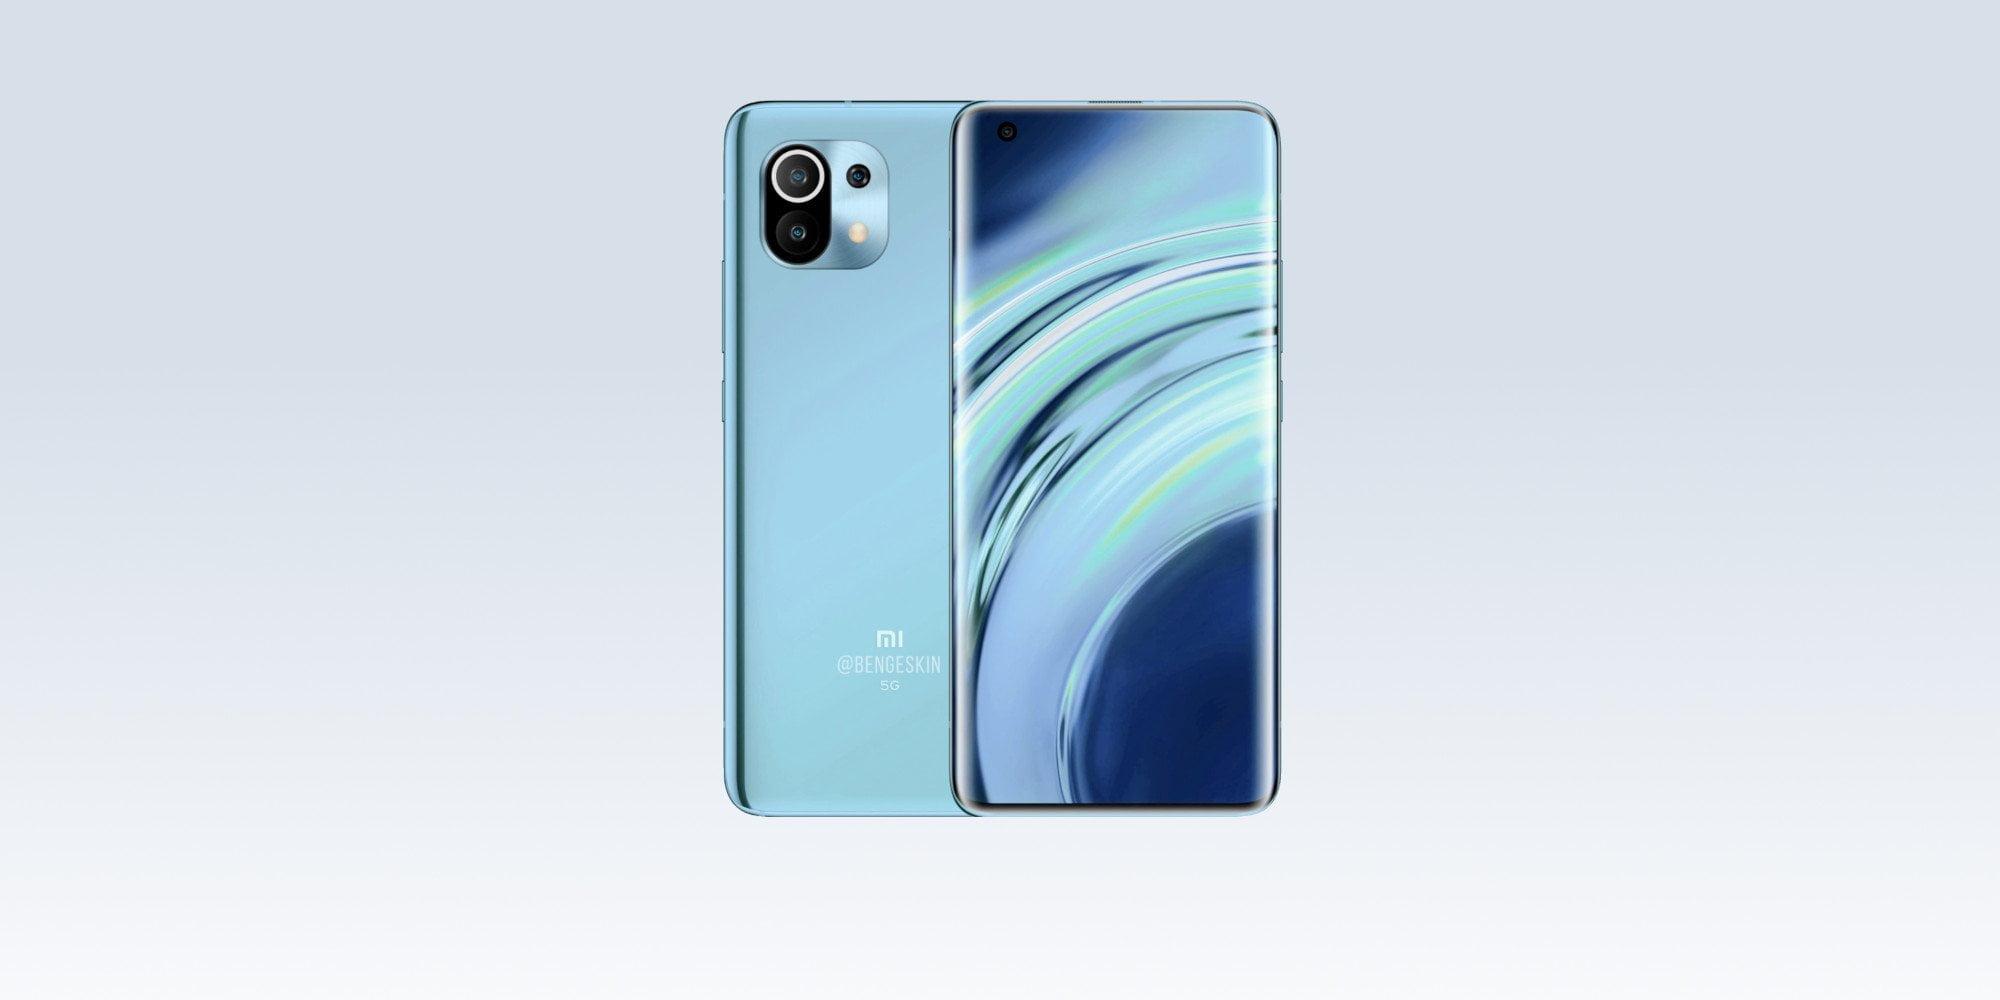 Xiaomi Mi 11 and Xiaomi Mi 11 Pro headers